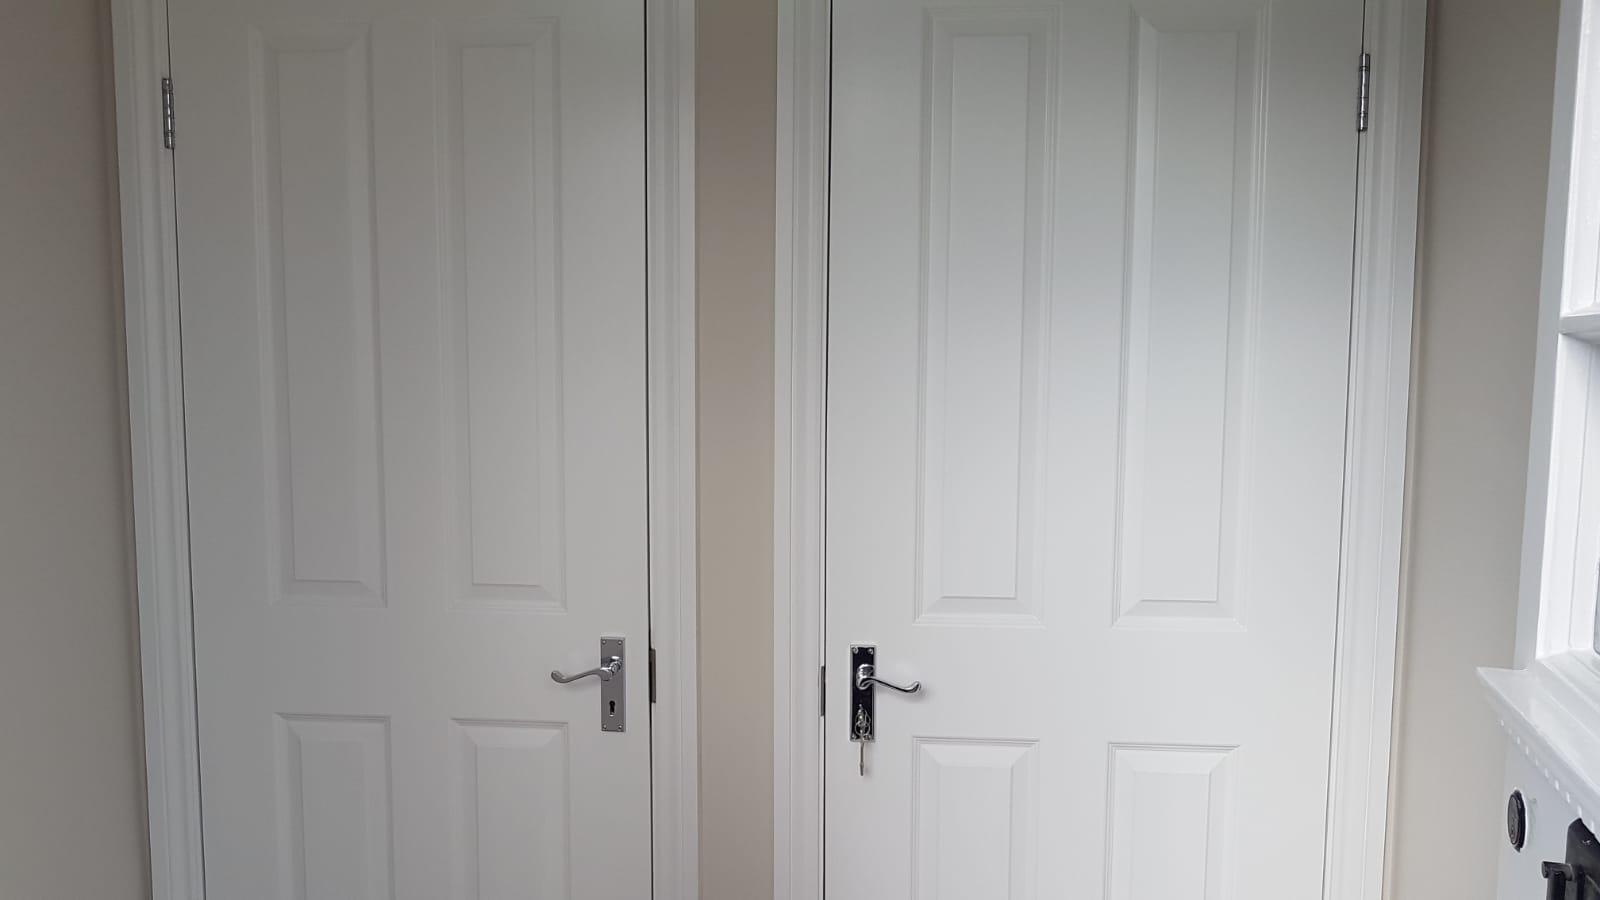 Flat entrance doors